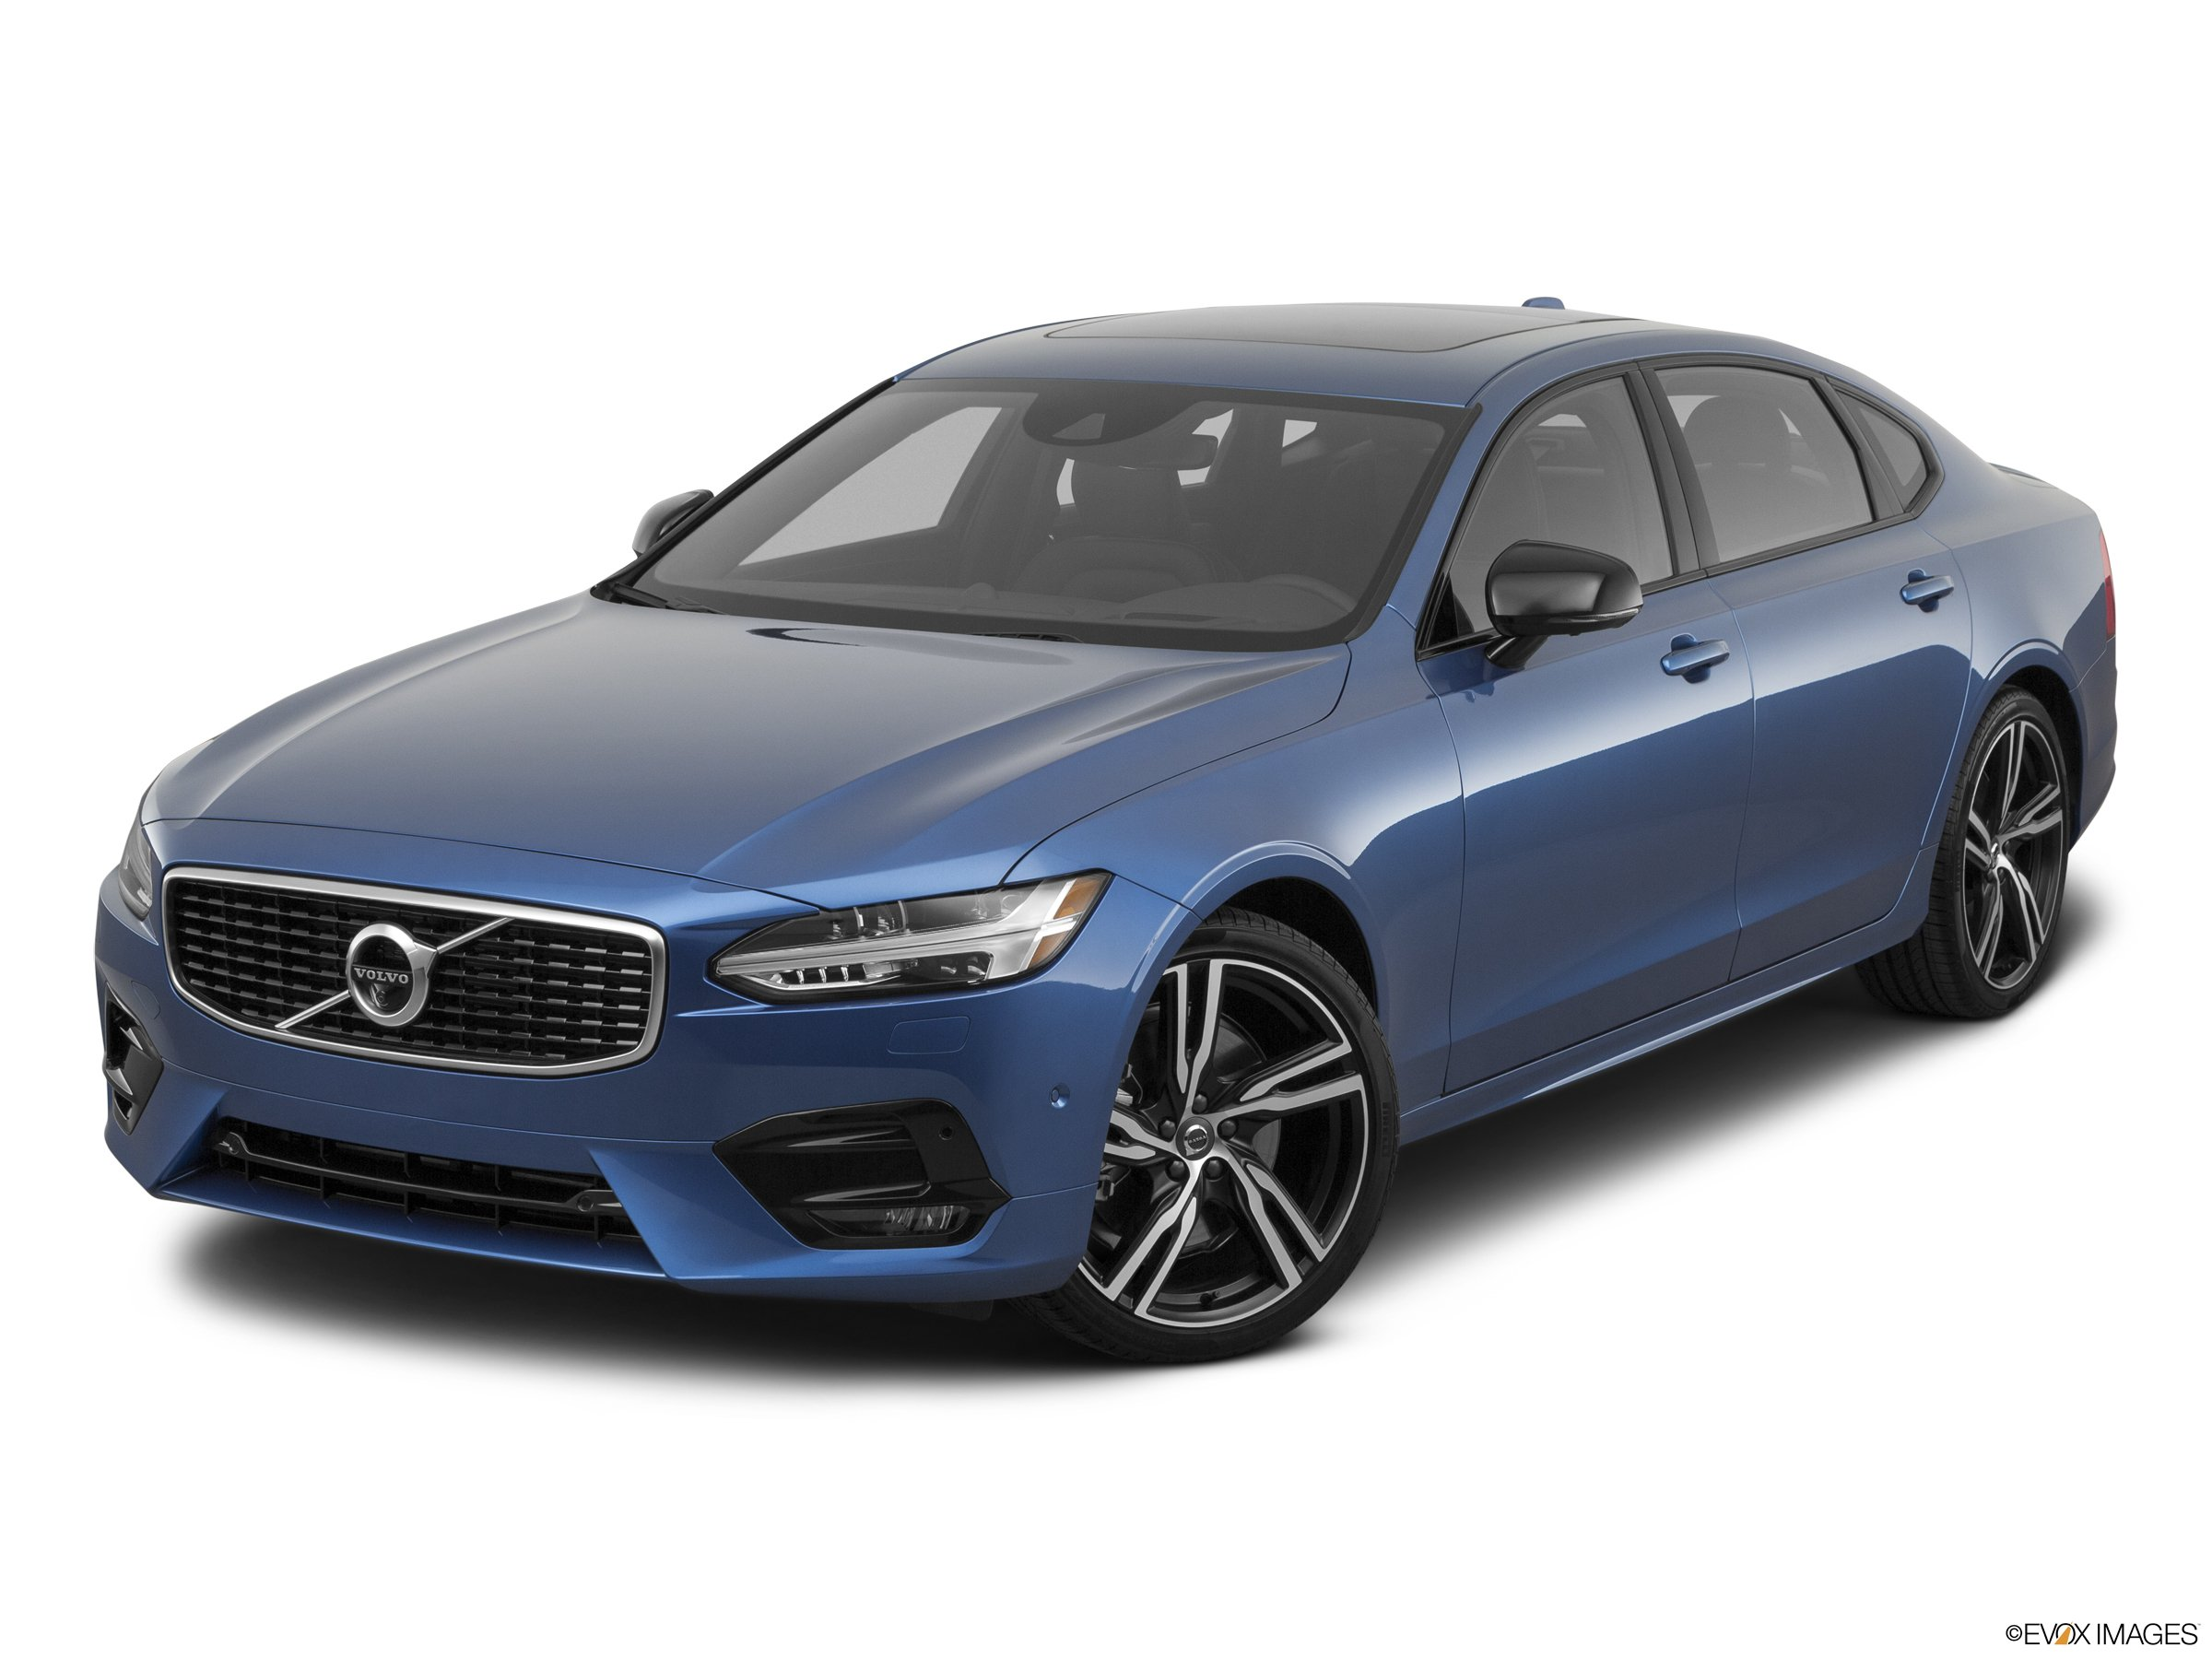 2020 Volvo S90 T6 R-Design AWD sedan